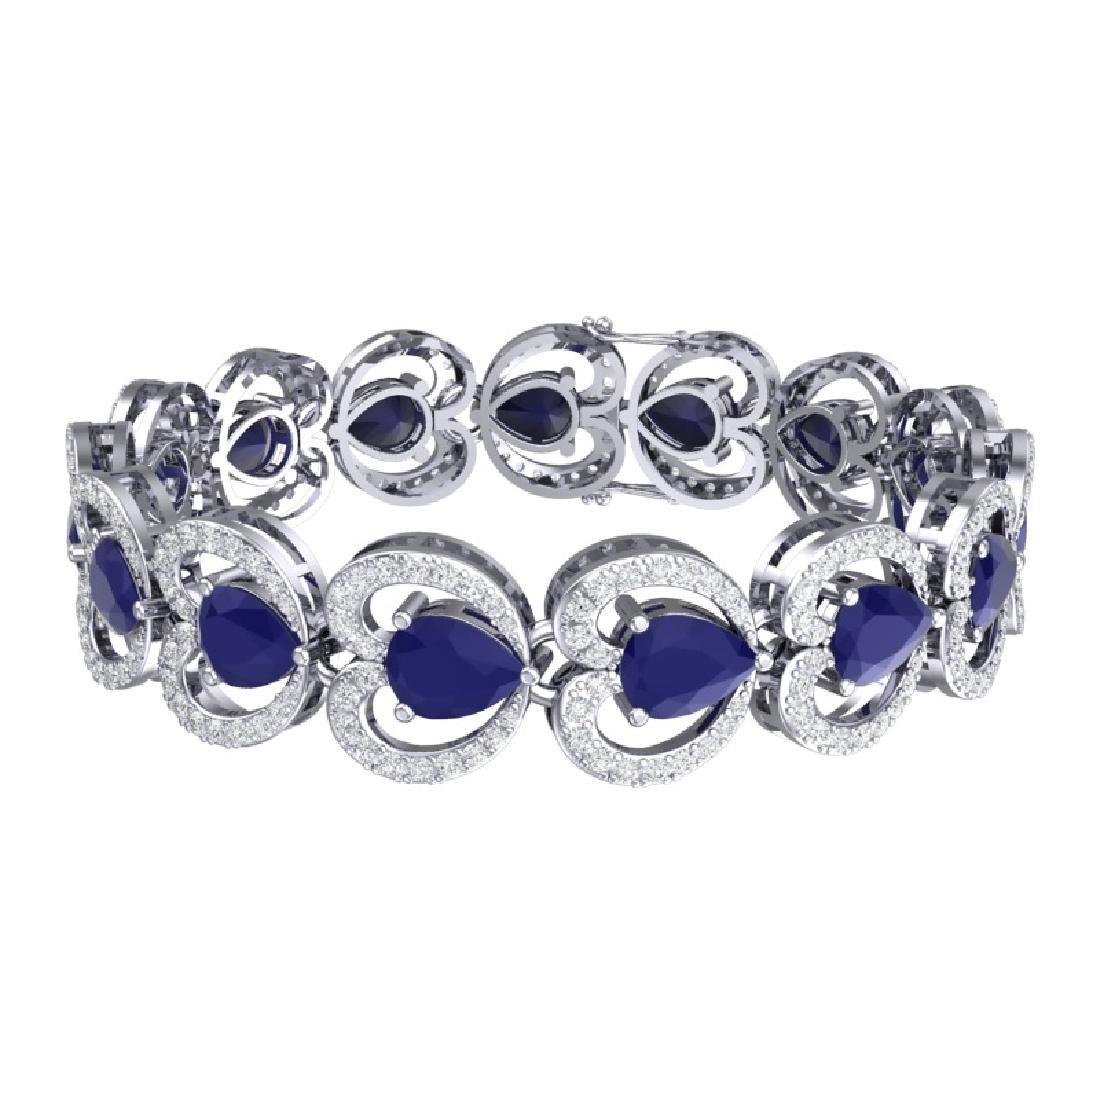 32.15 CTW Royalty Sapphire & VS Diamond Bracelet 18K - 3